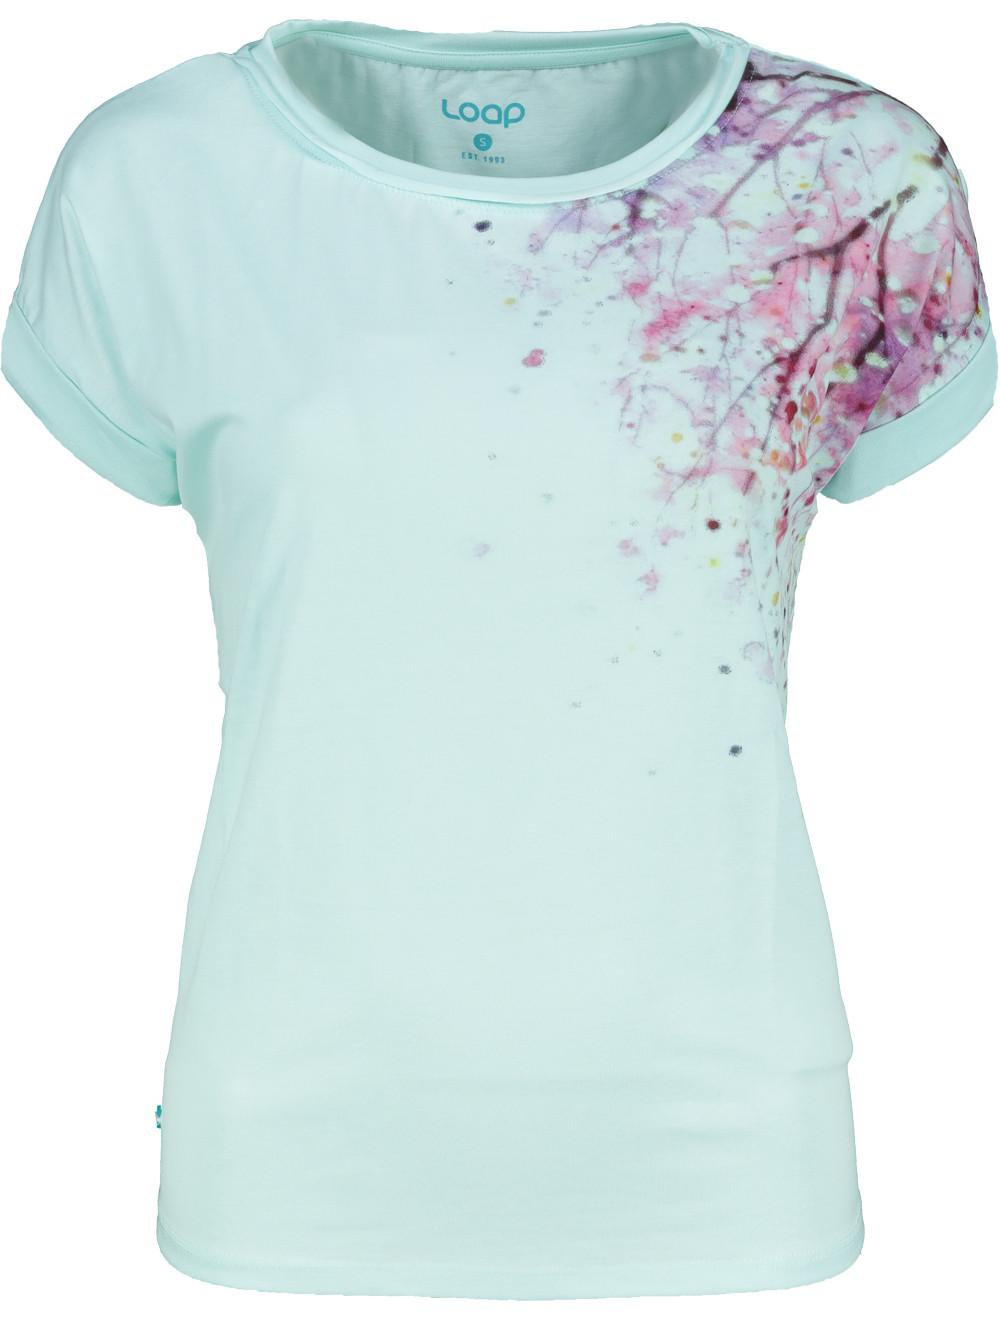 Women's T-Shirt LOAP ALYSSA